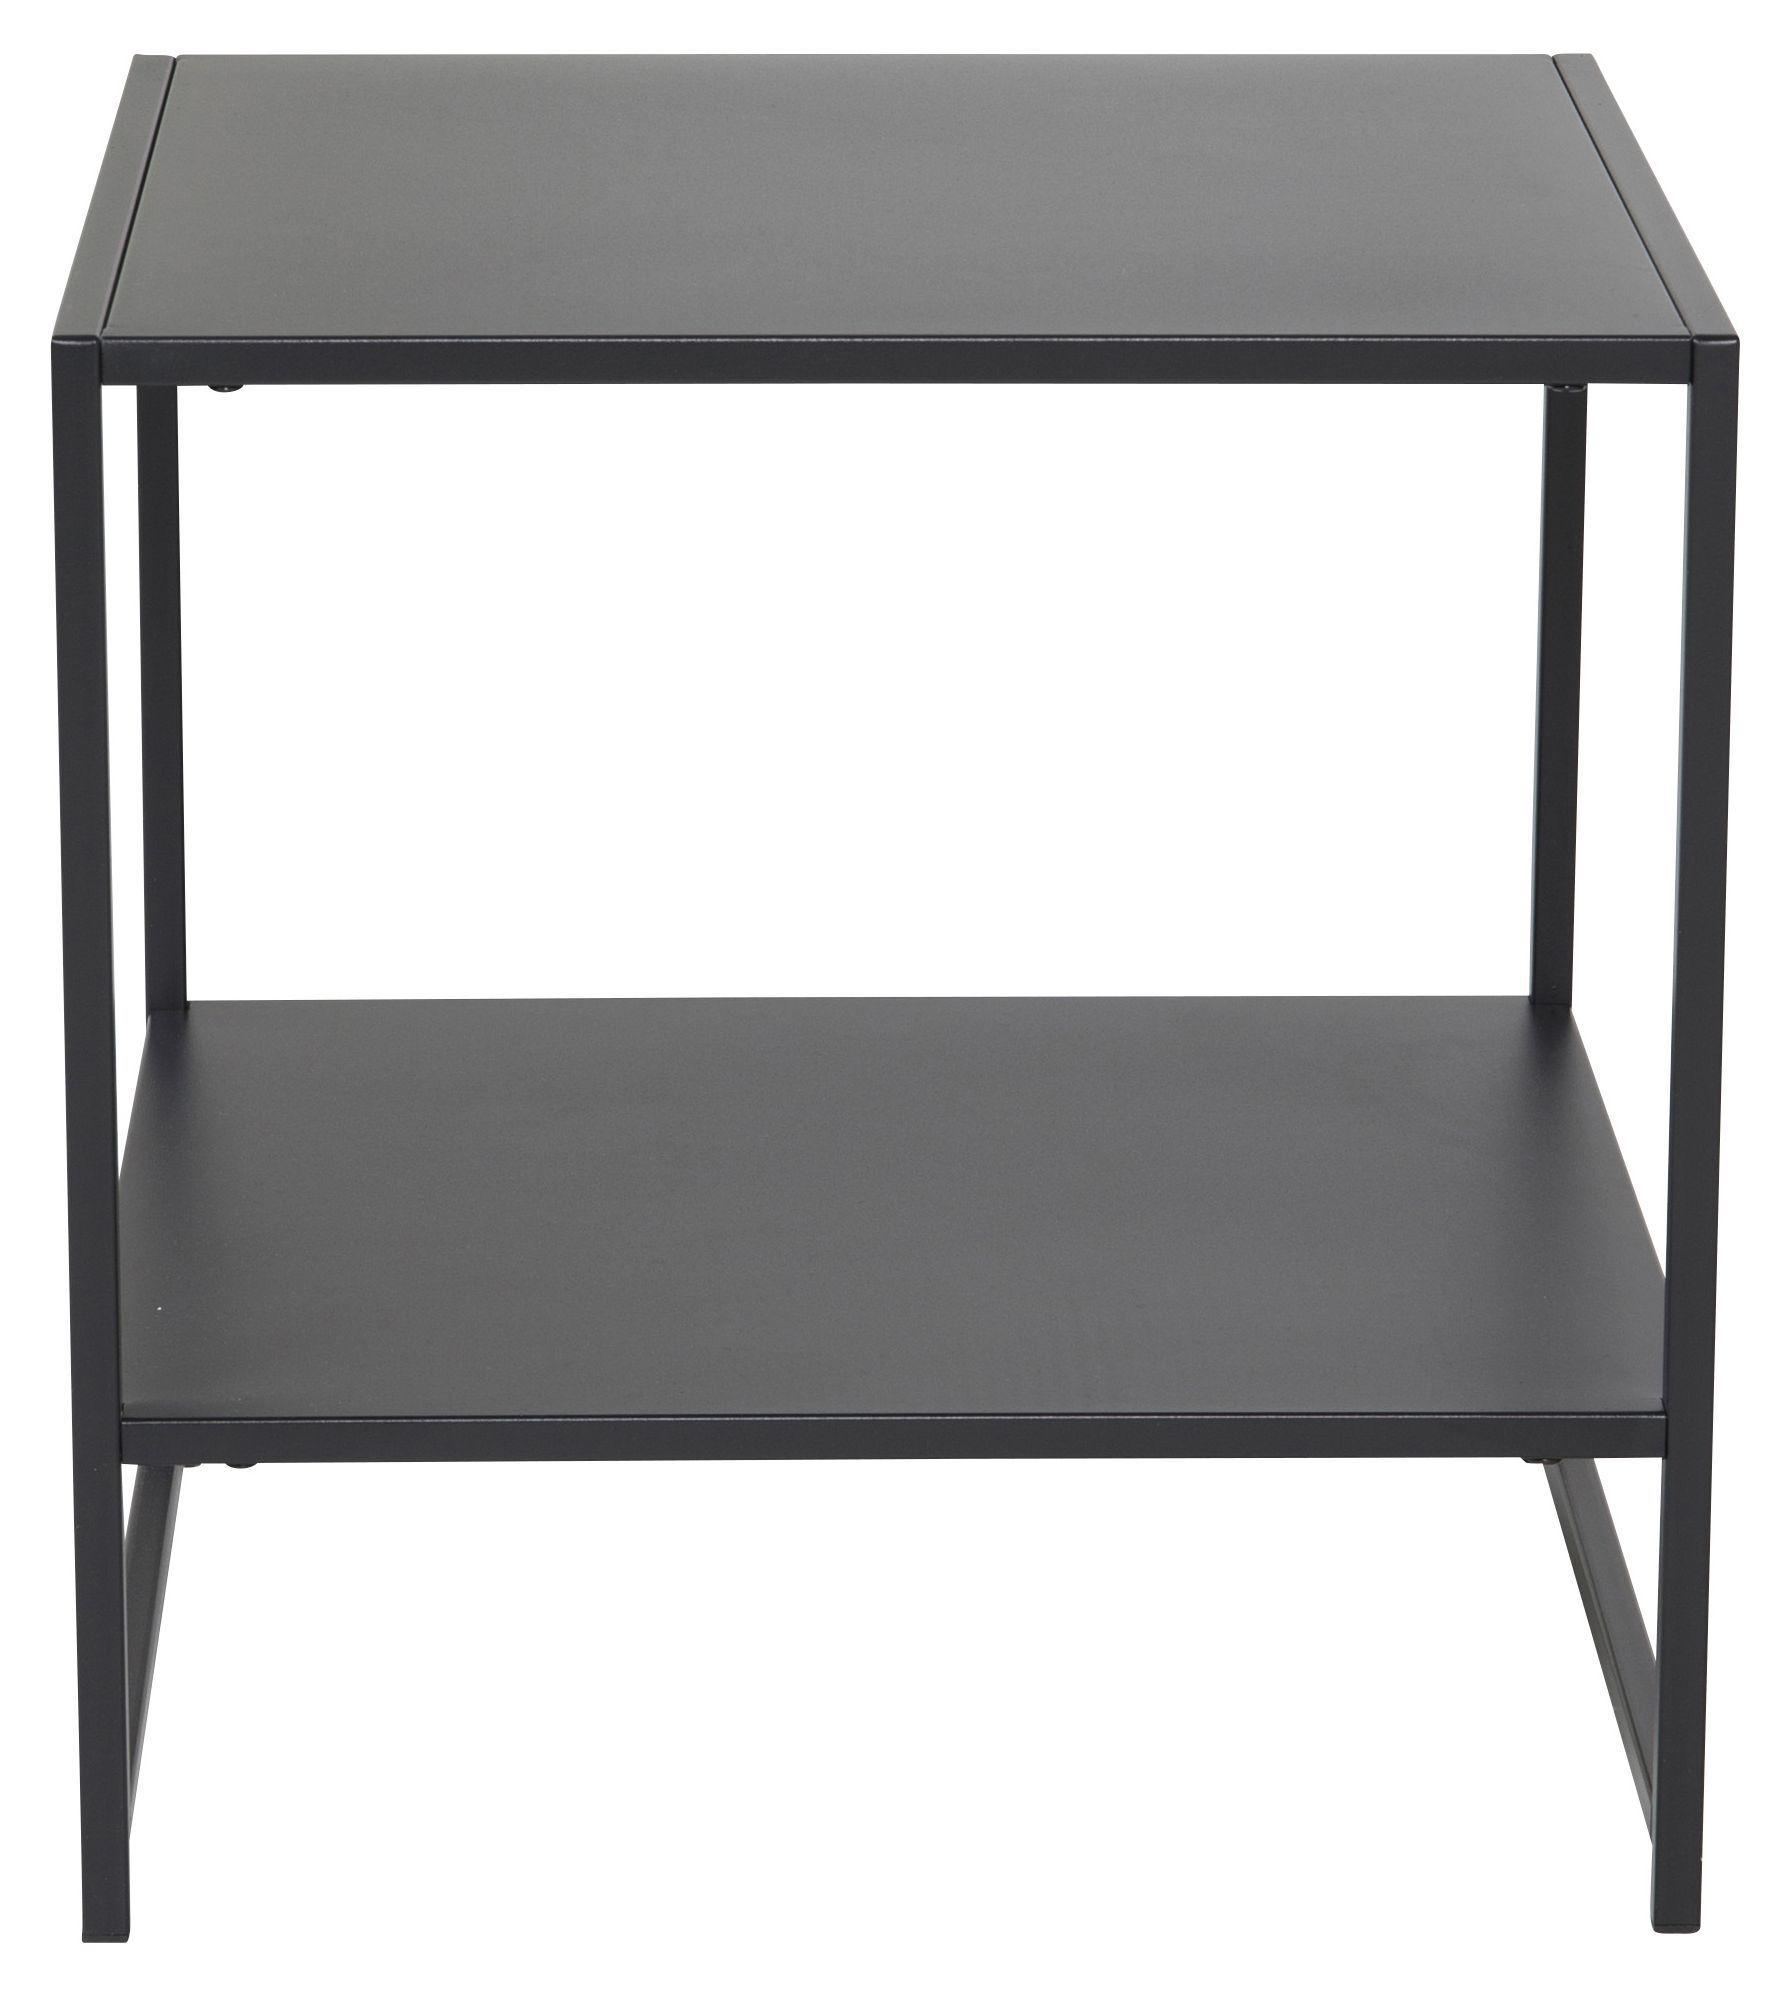 Venture Design Staal, Sidebord m. hylle, Sort Metall   Unoliving